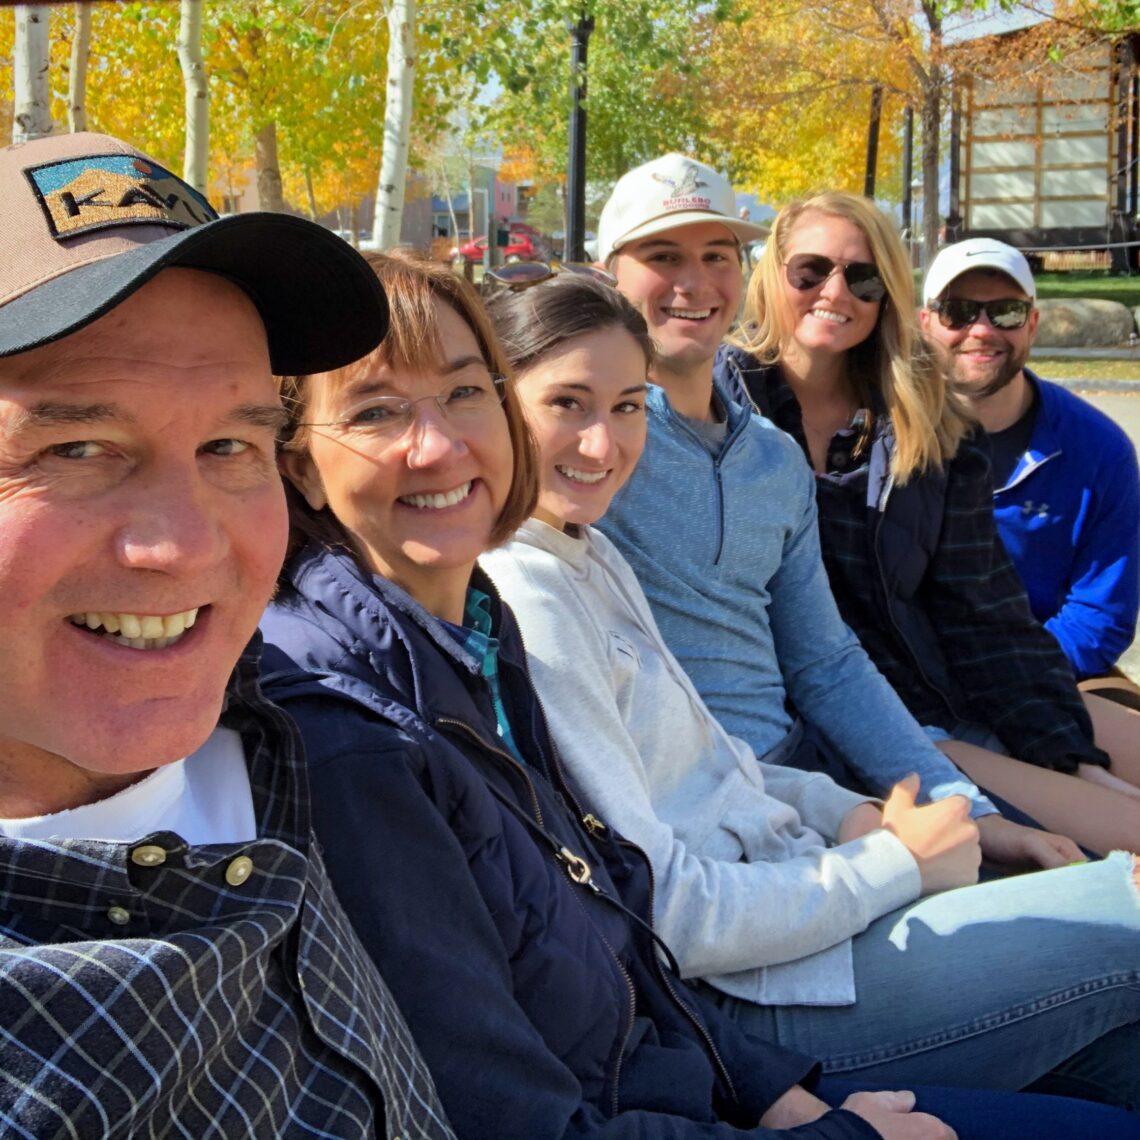 Group Selfie on Bench in BV